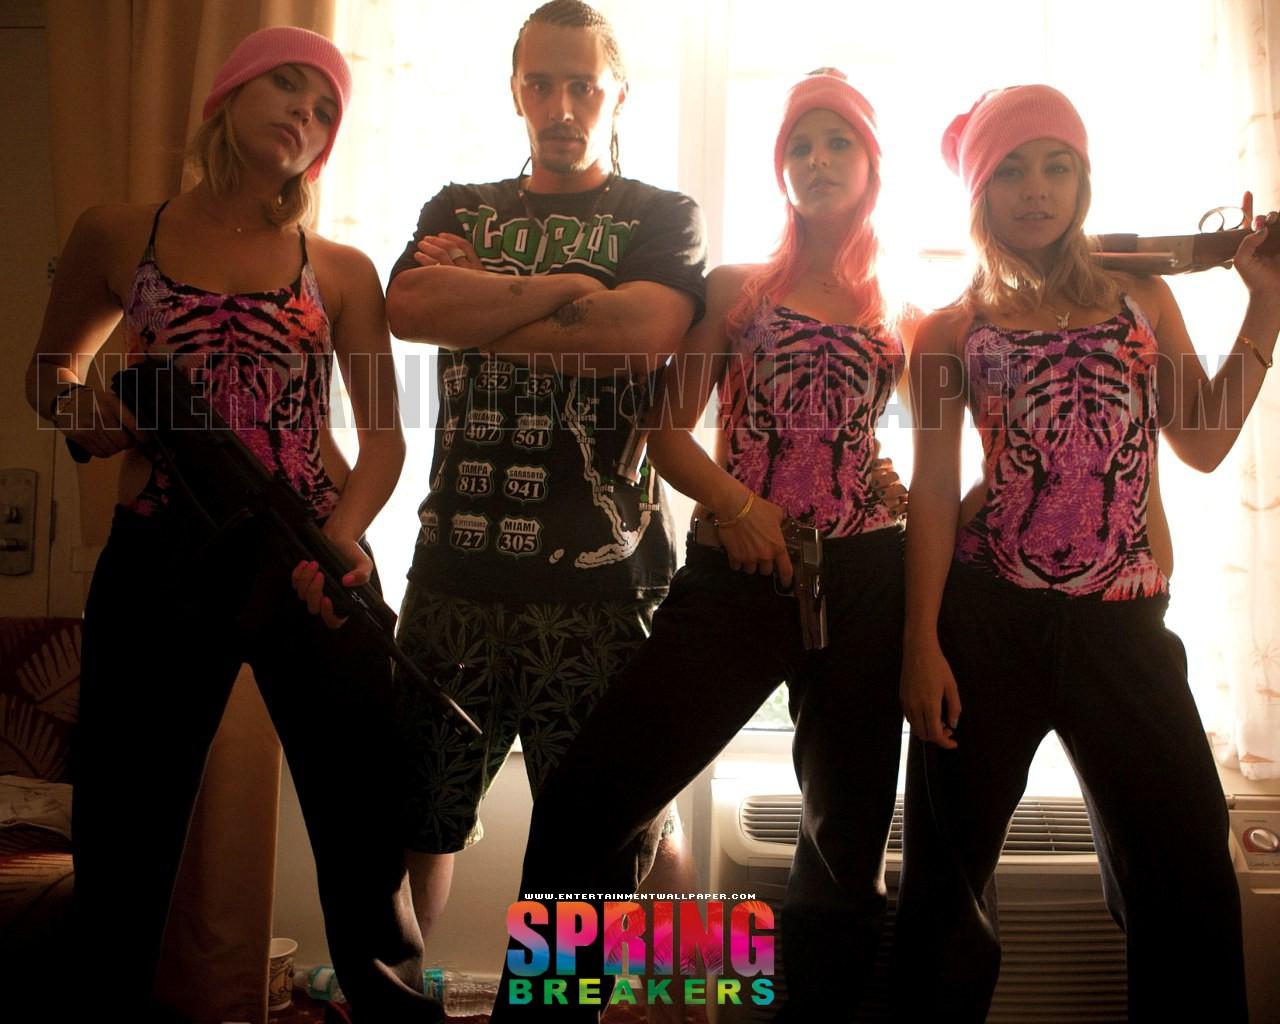 Spring Breakers [2013]   Upcoming Movies Wallpaper 34093260 1280x1024